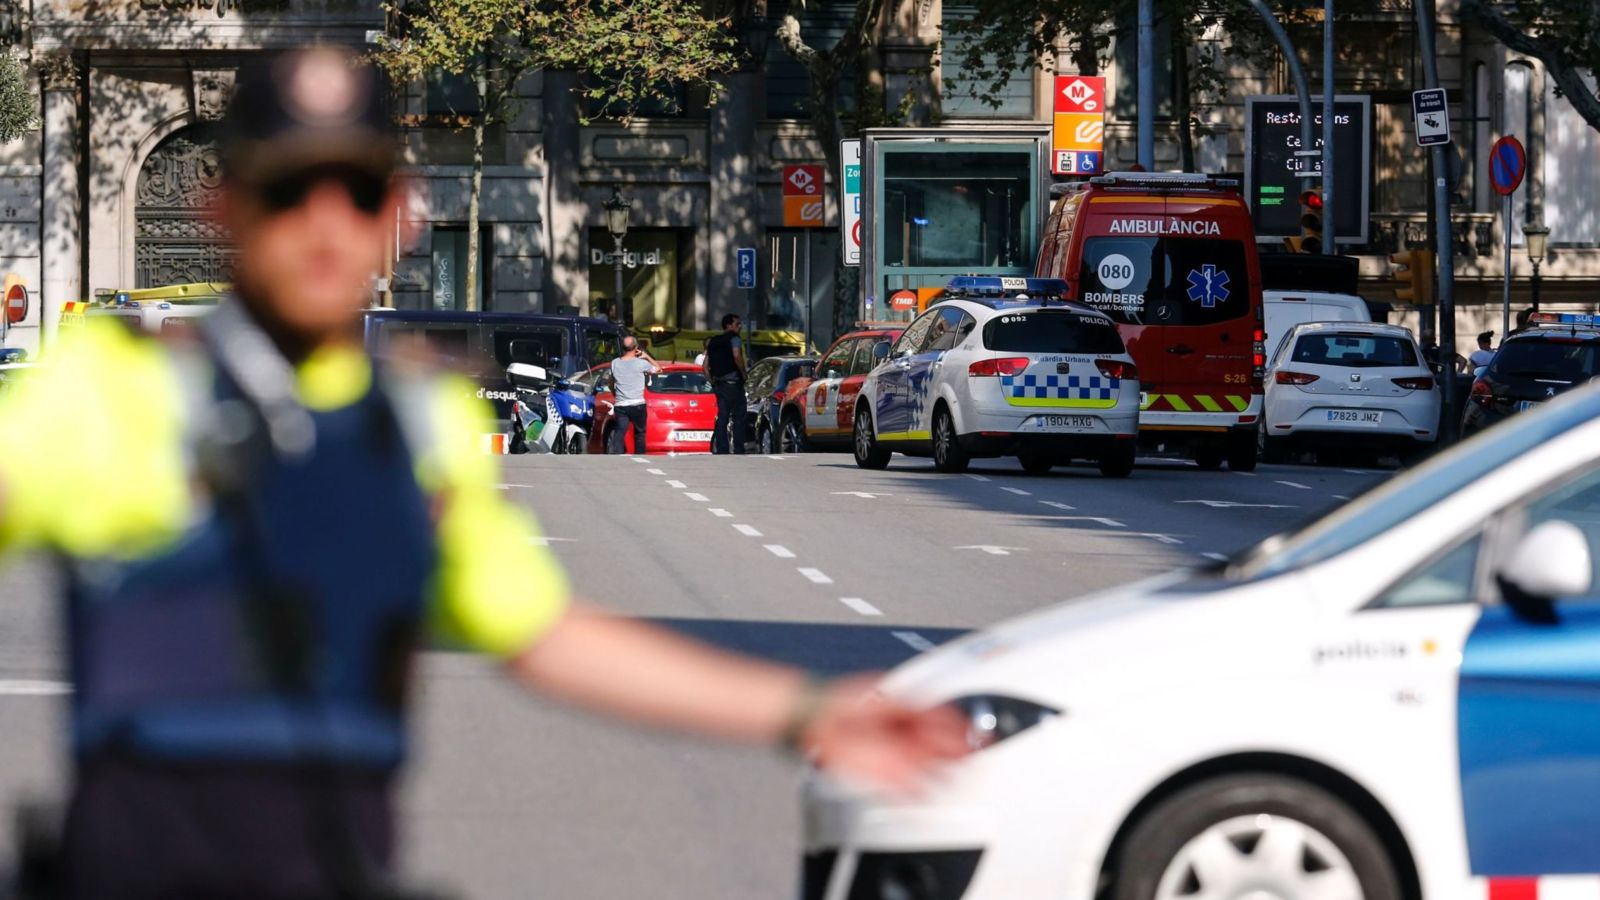 BARCELONA VAN ATTACK; 1 KILLED AND 32 INJURED